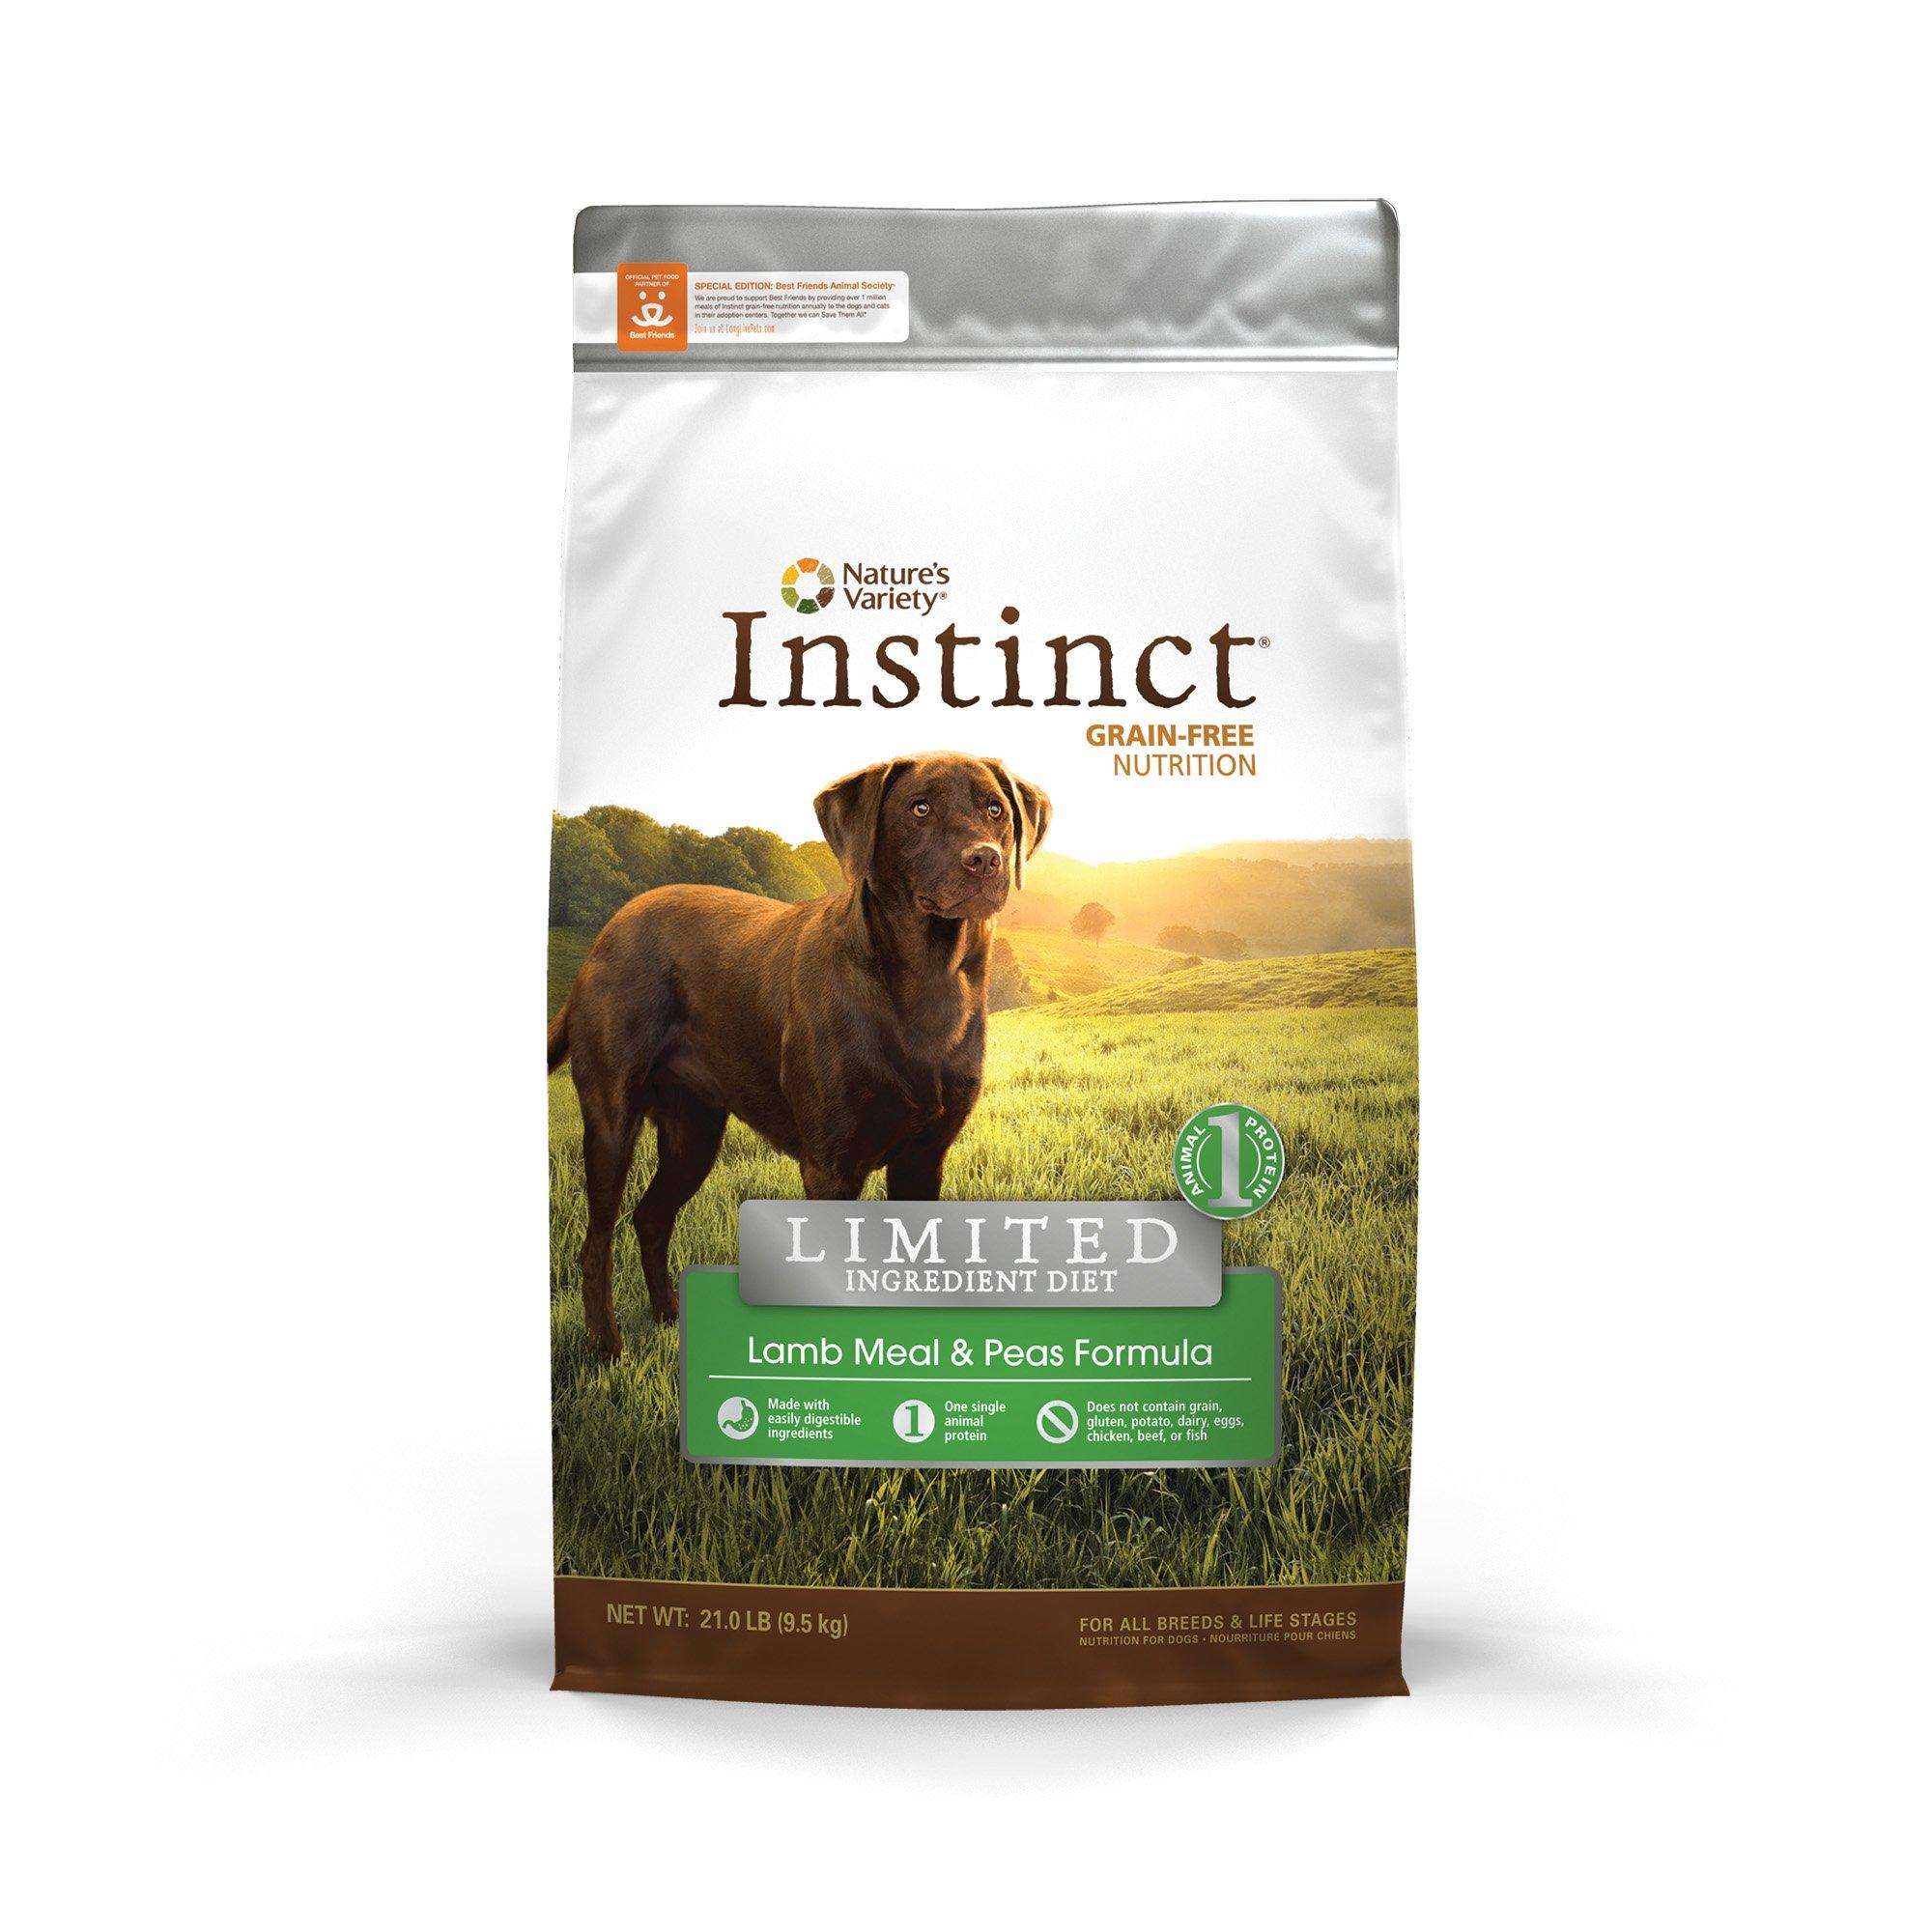 Nature's Variety Instinct Grain-Free Limited Ingredient Diet Lamb Meal & Peas Dog Food